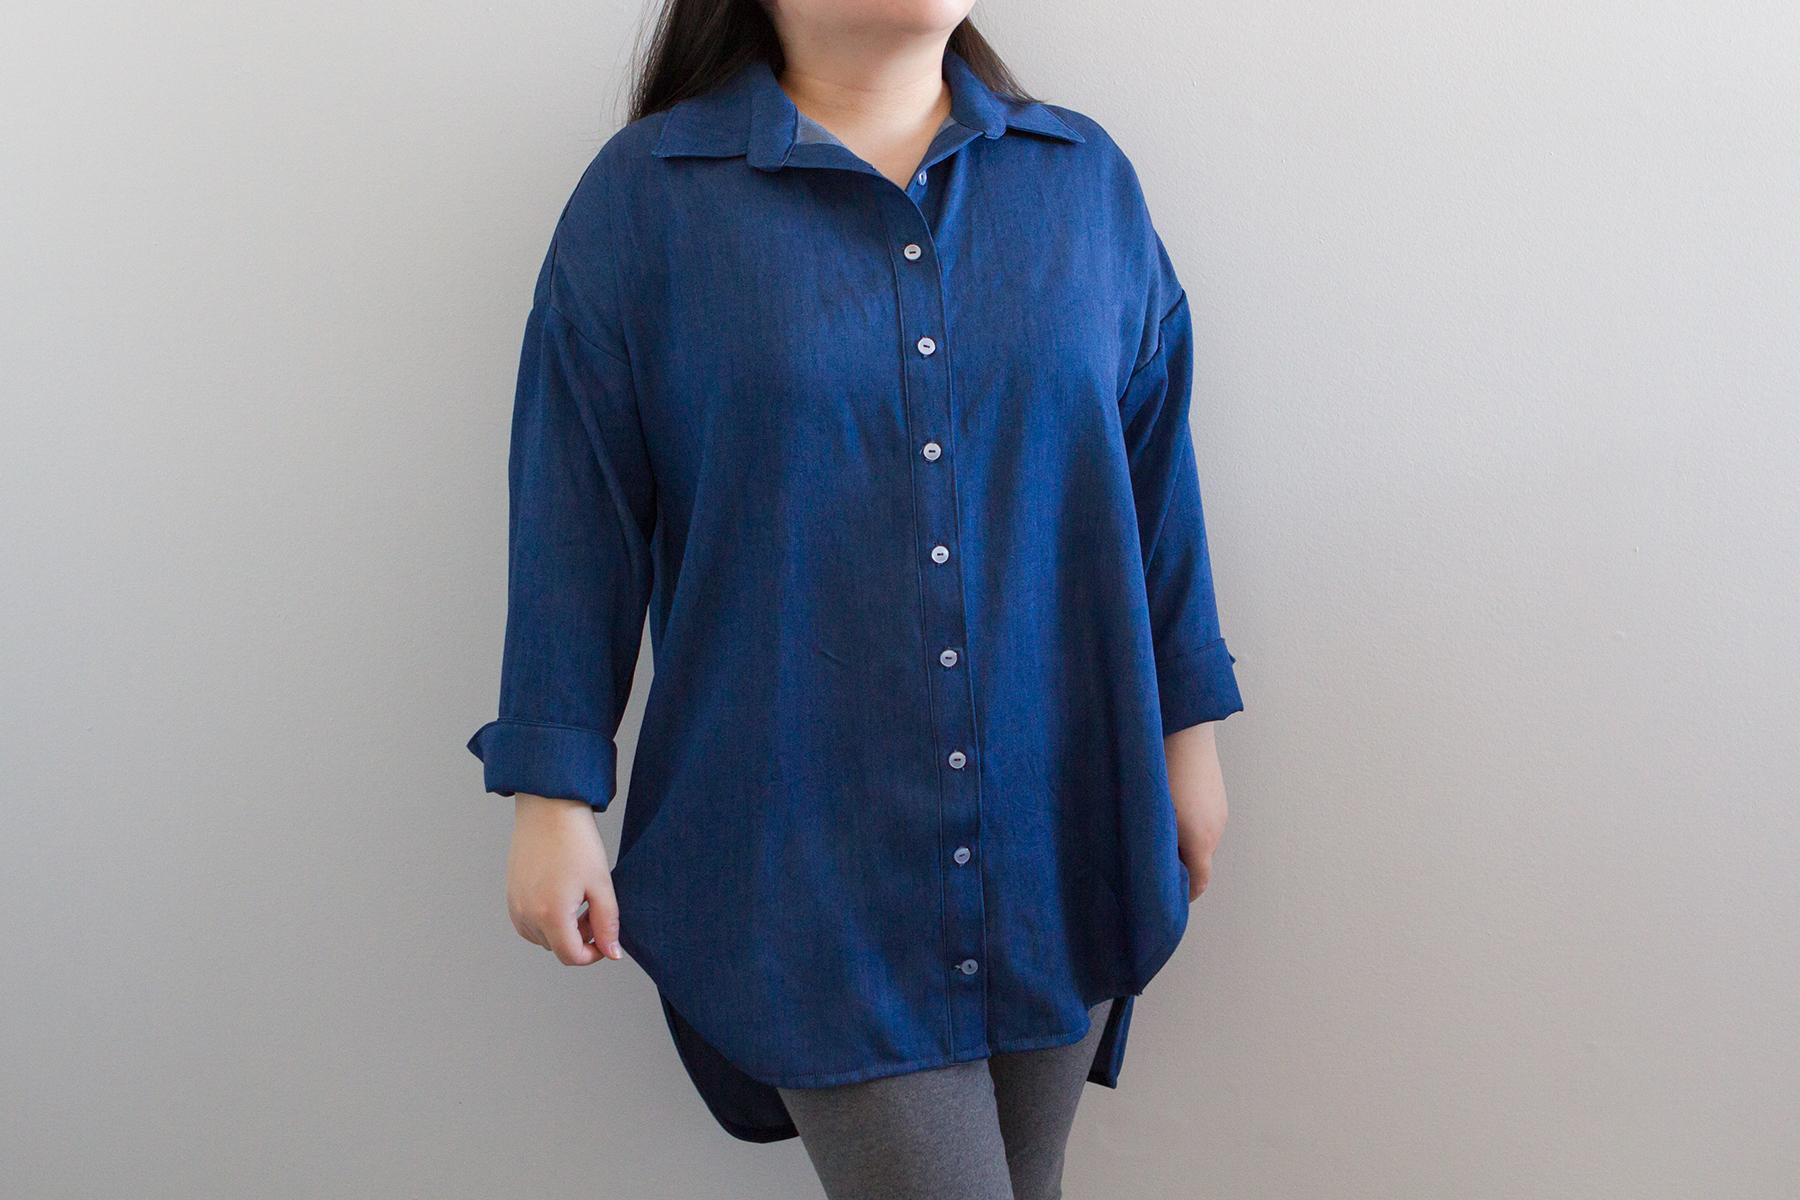 Kalle Shirt by Closet Case Patterns